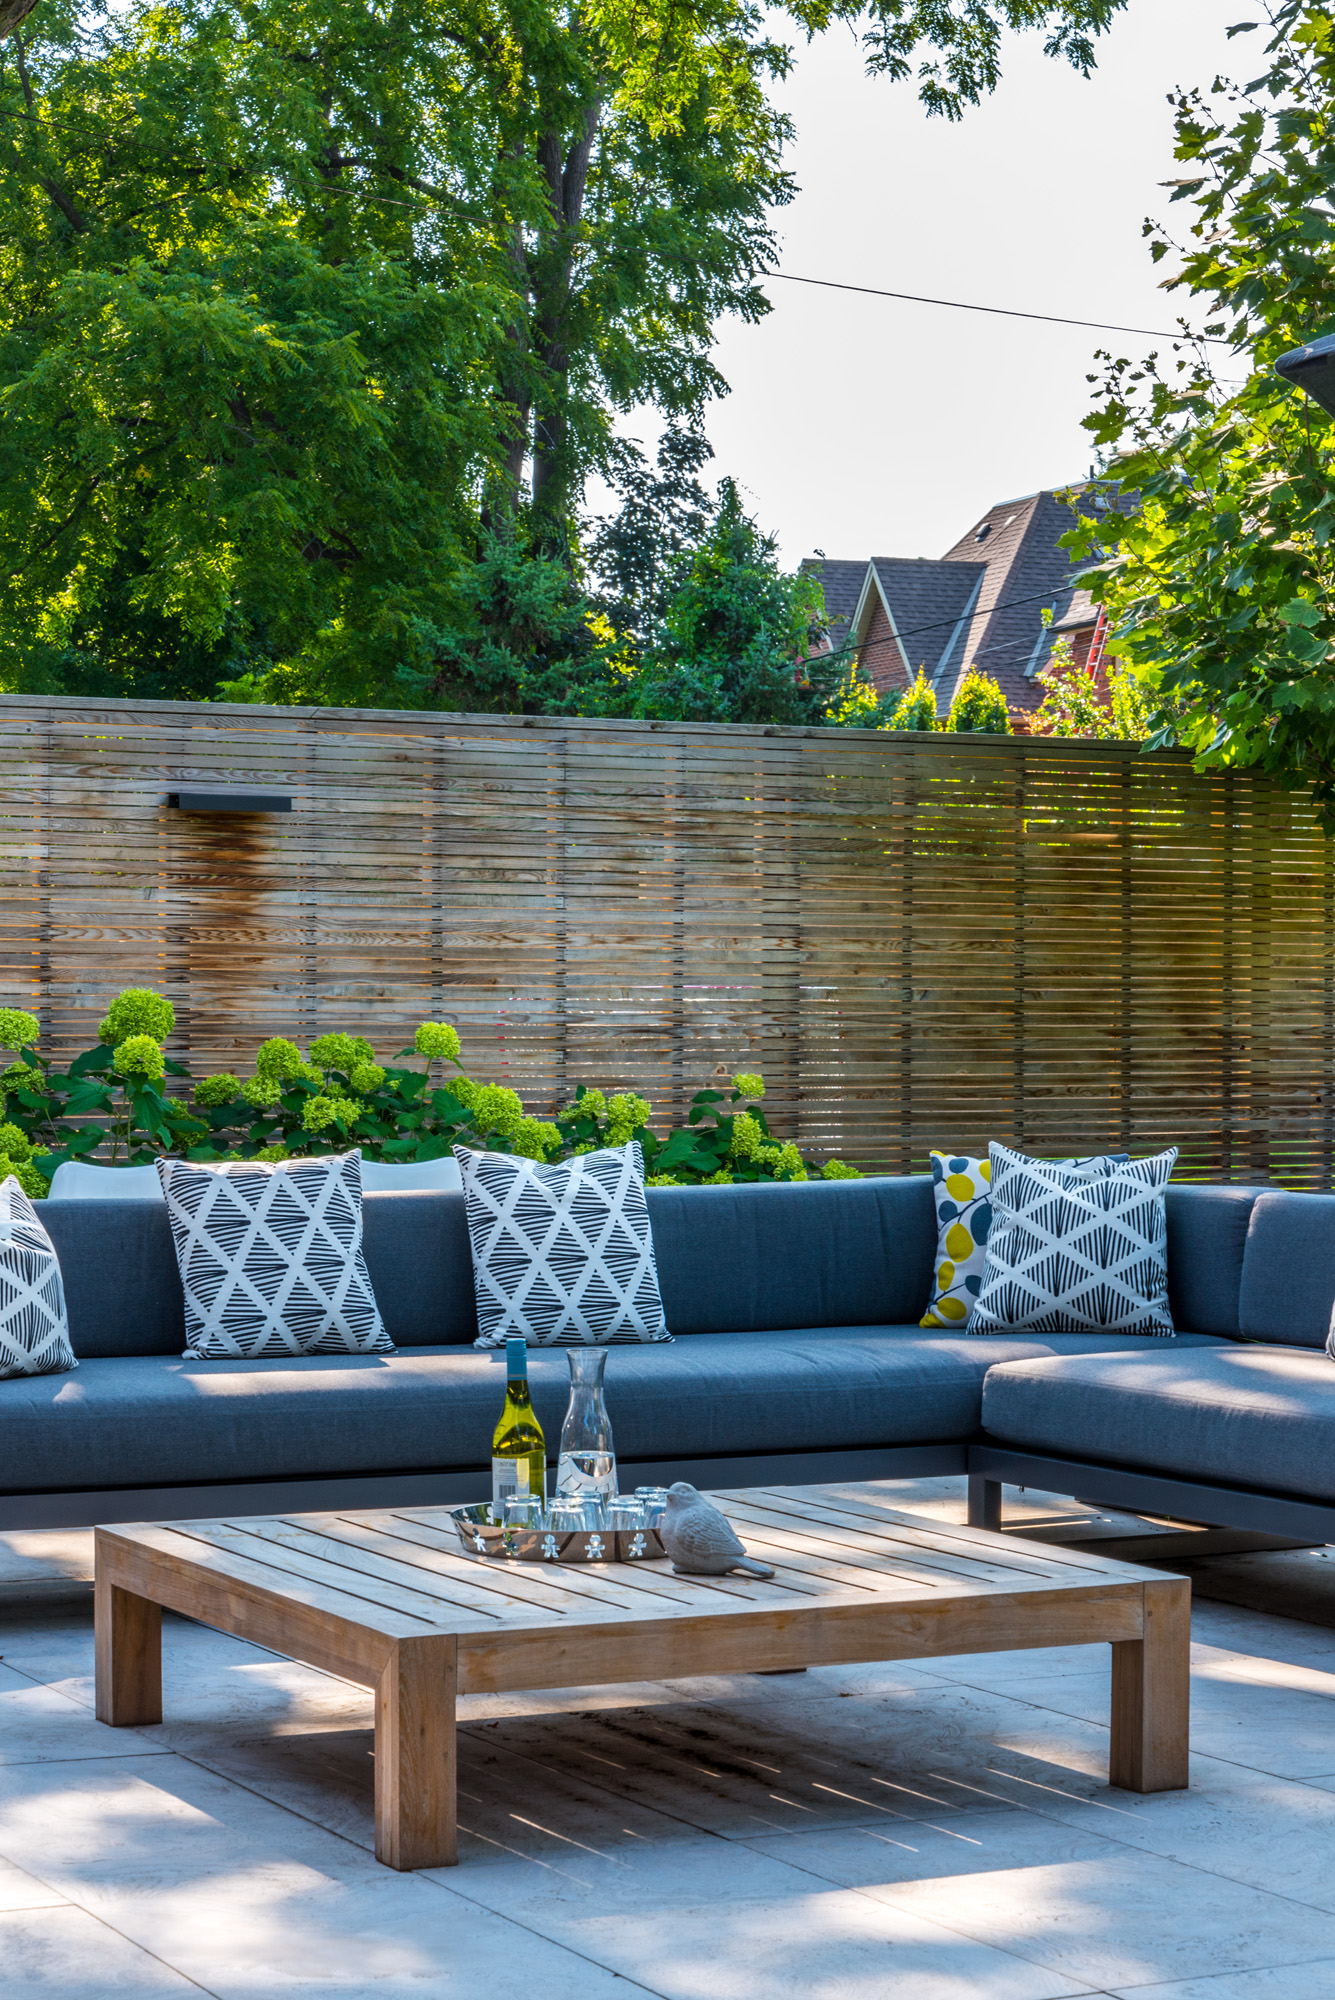 Cricket Club House Backyard Sectional